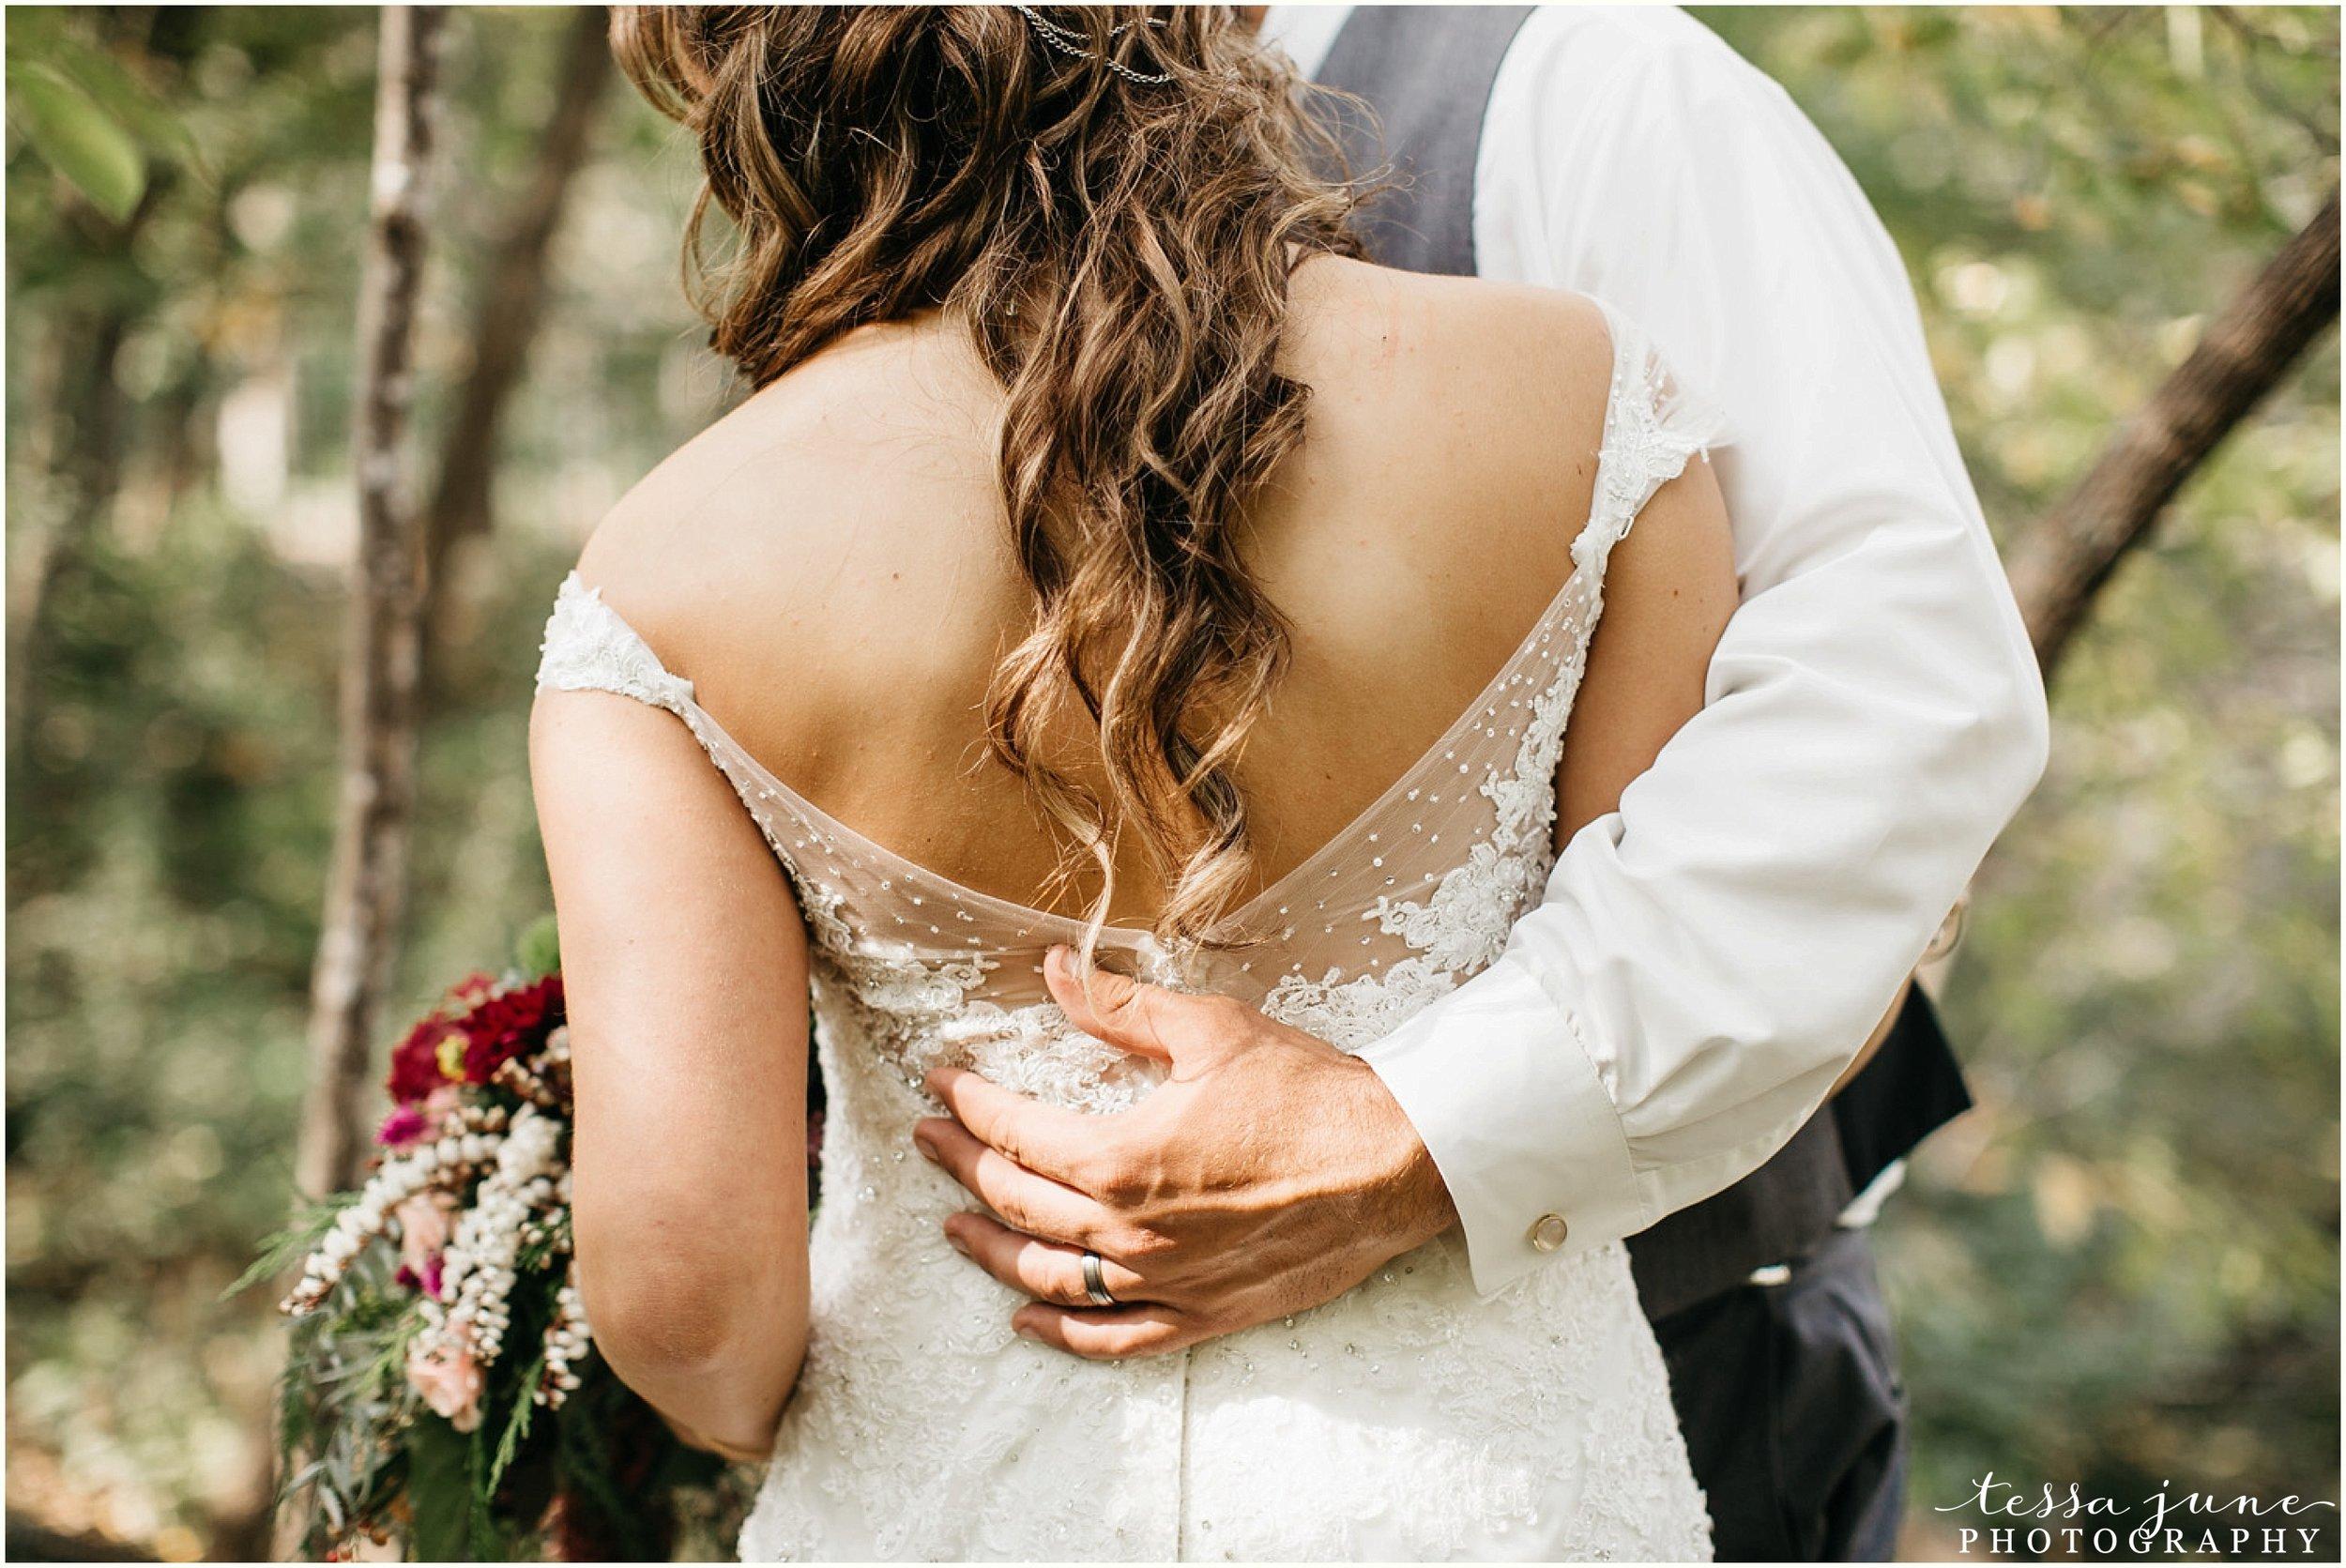 bohemian-minnesota-wedding-mismatched-bridesmaid-dresses-waterfall-st-cloud-tessa-june-photography-48.jpg